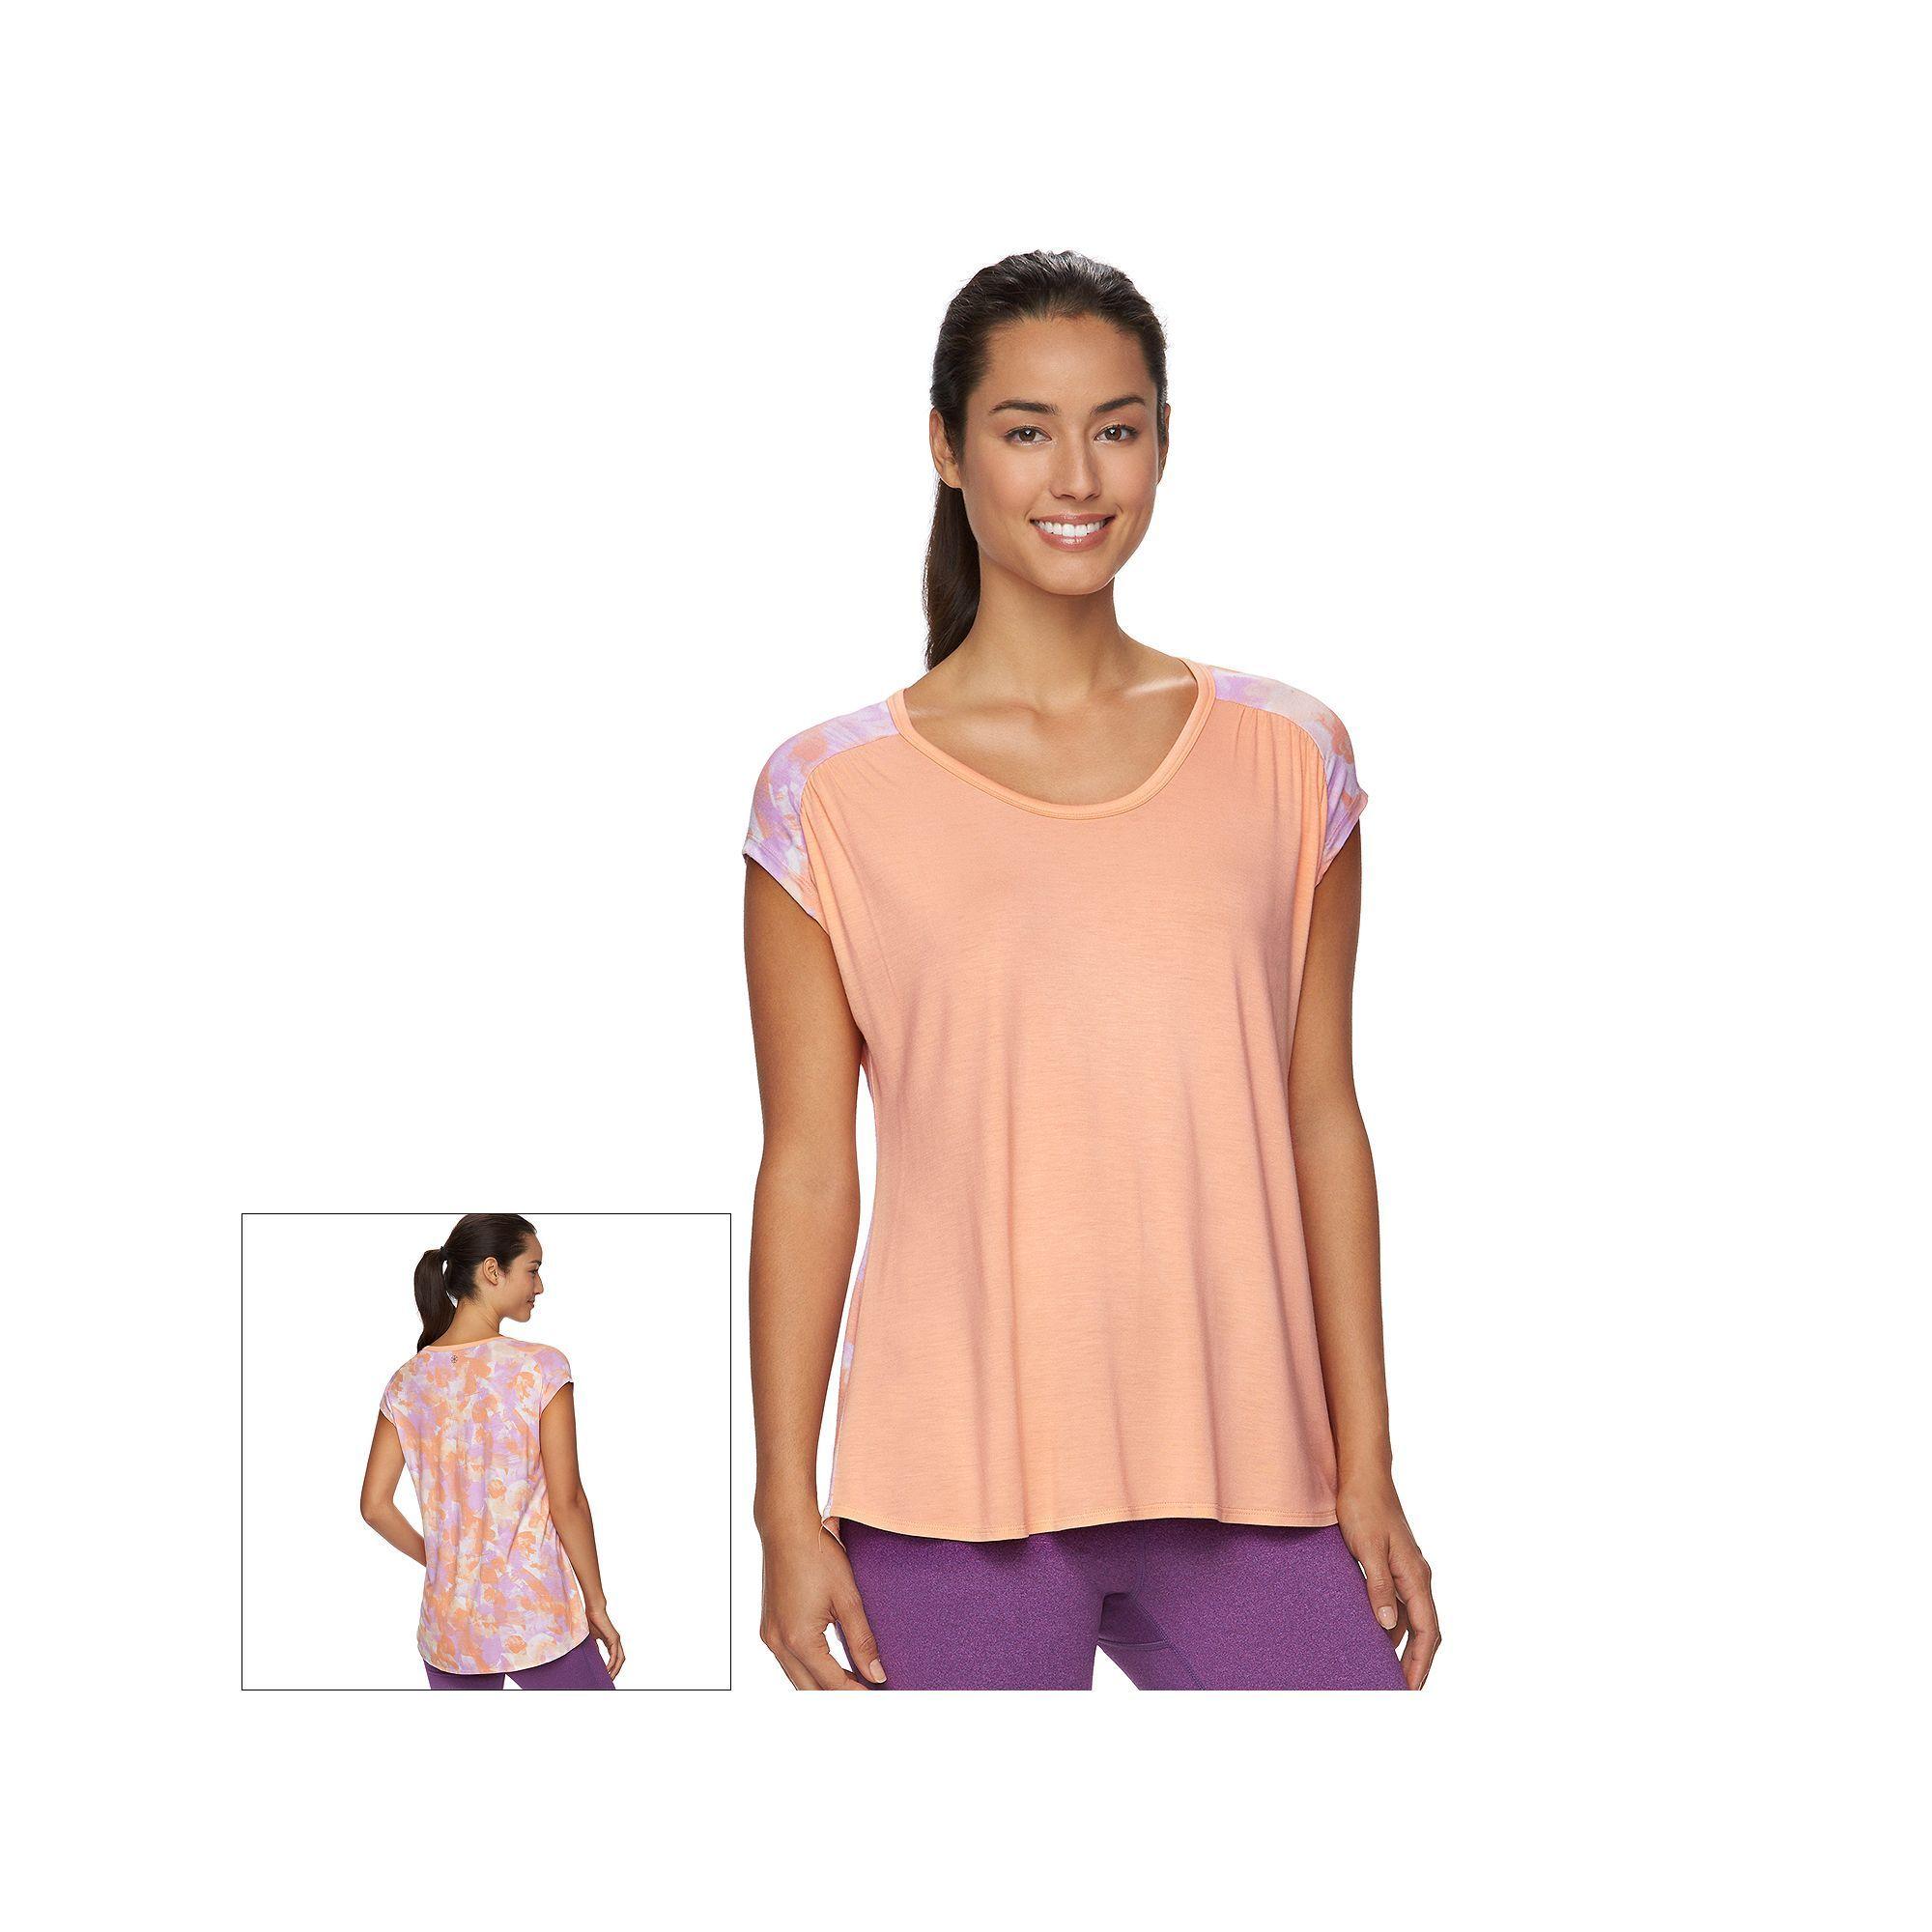 Women's Gaiam Reflect Hi-Low Tee, Size: XS, Orange Oth